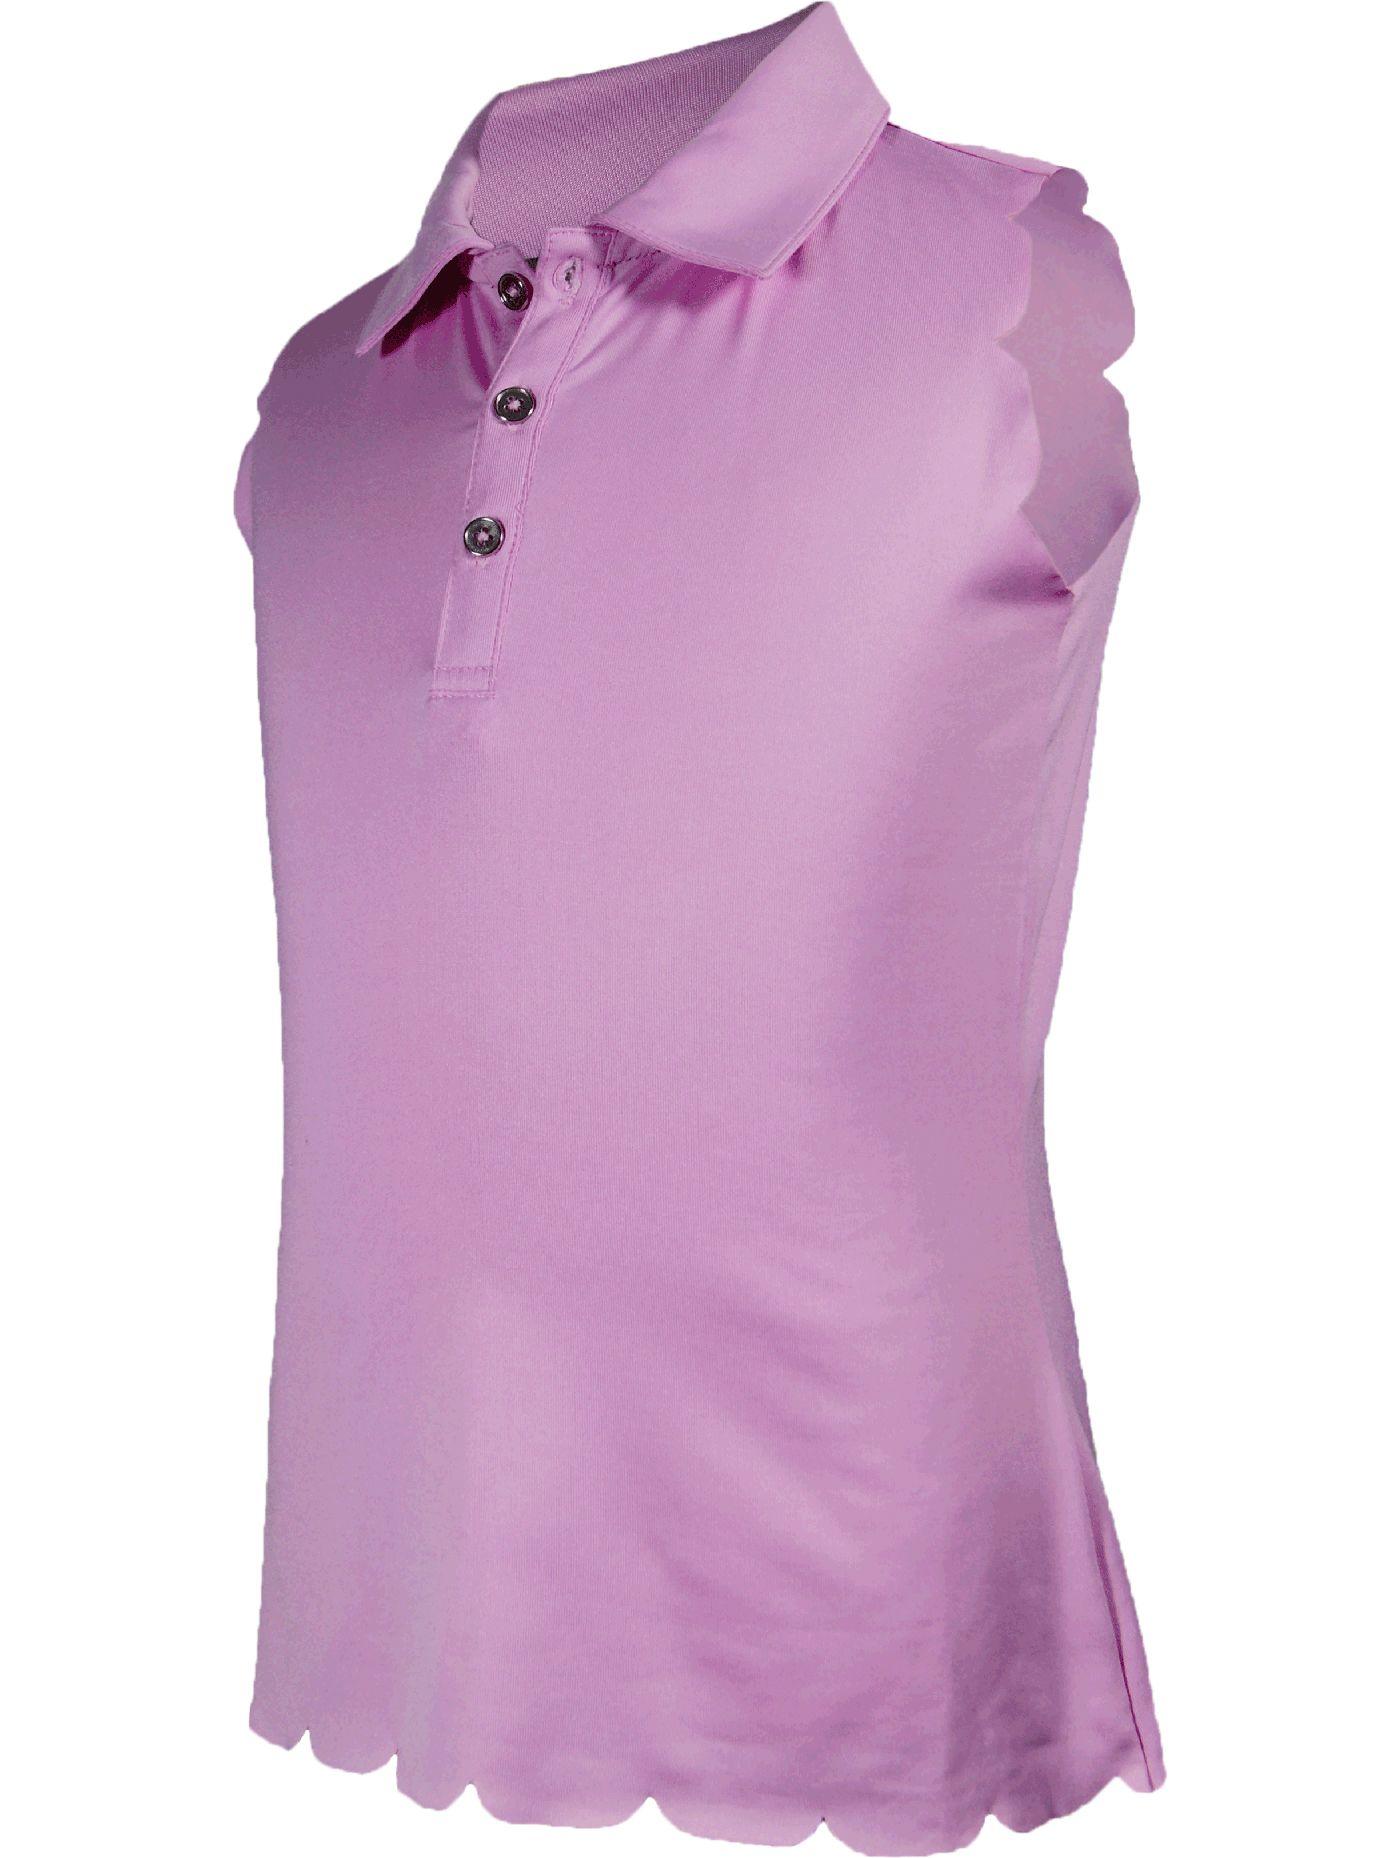 Garb Girls' Lauren Sleeveless Golf Polo